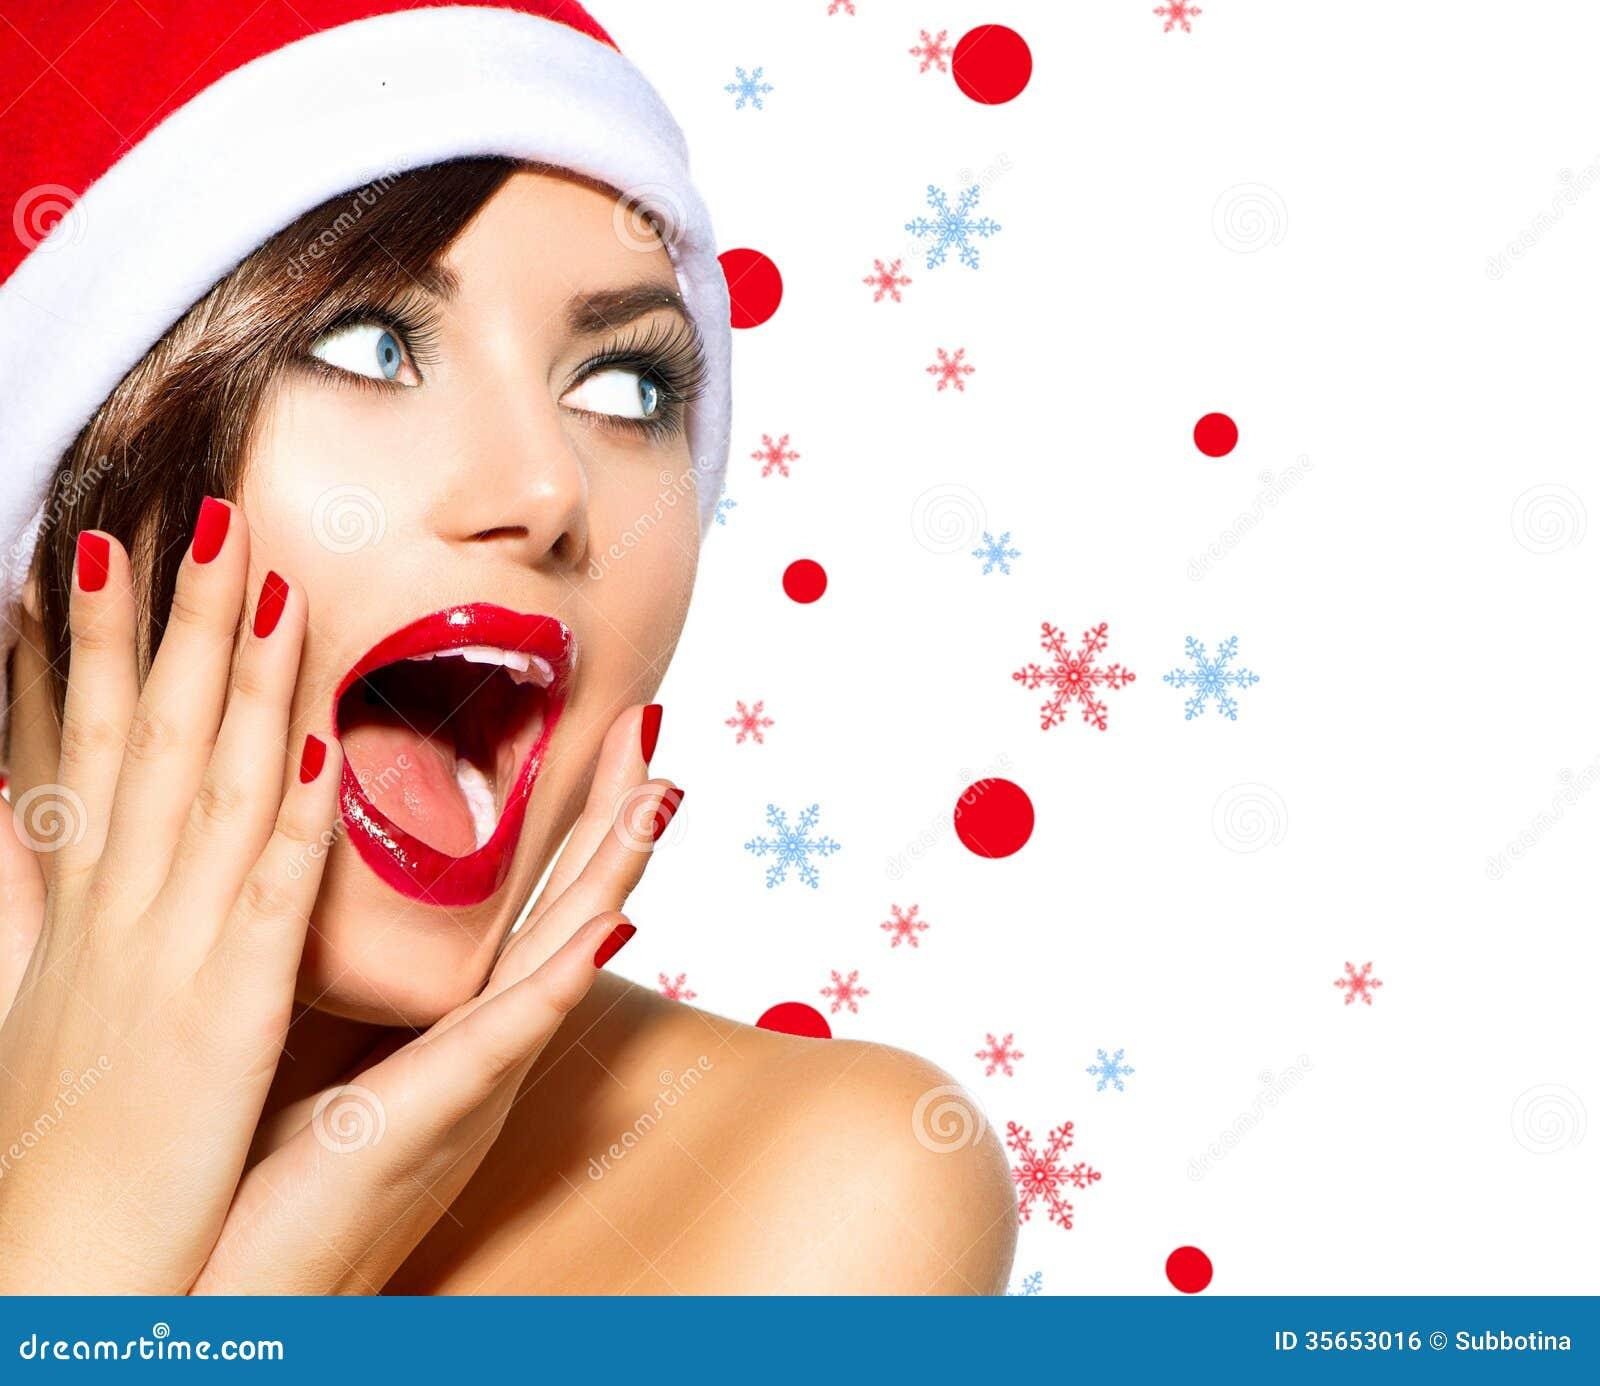 Christmas Beauty.Christmas Woman Stock Photo Image Of Isolated Happy 35653016